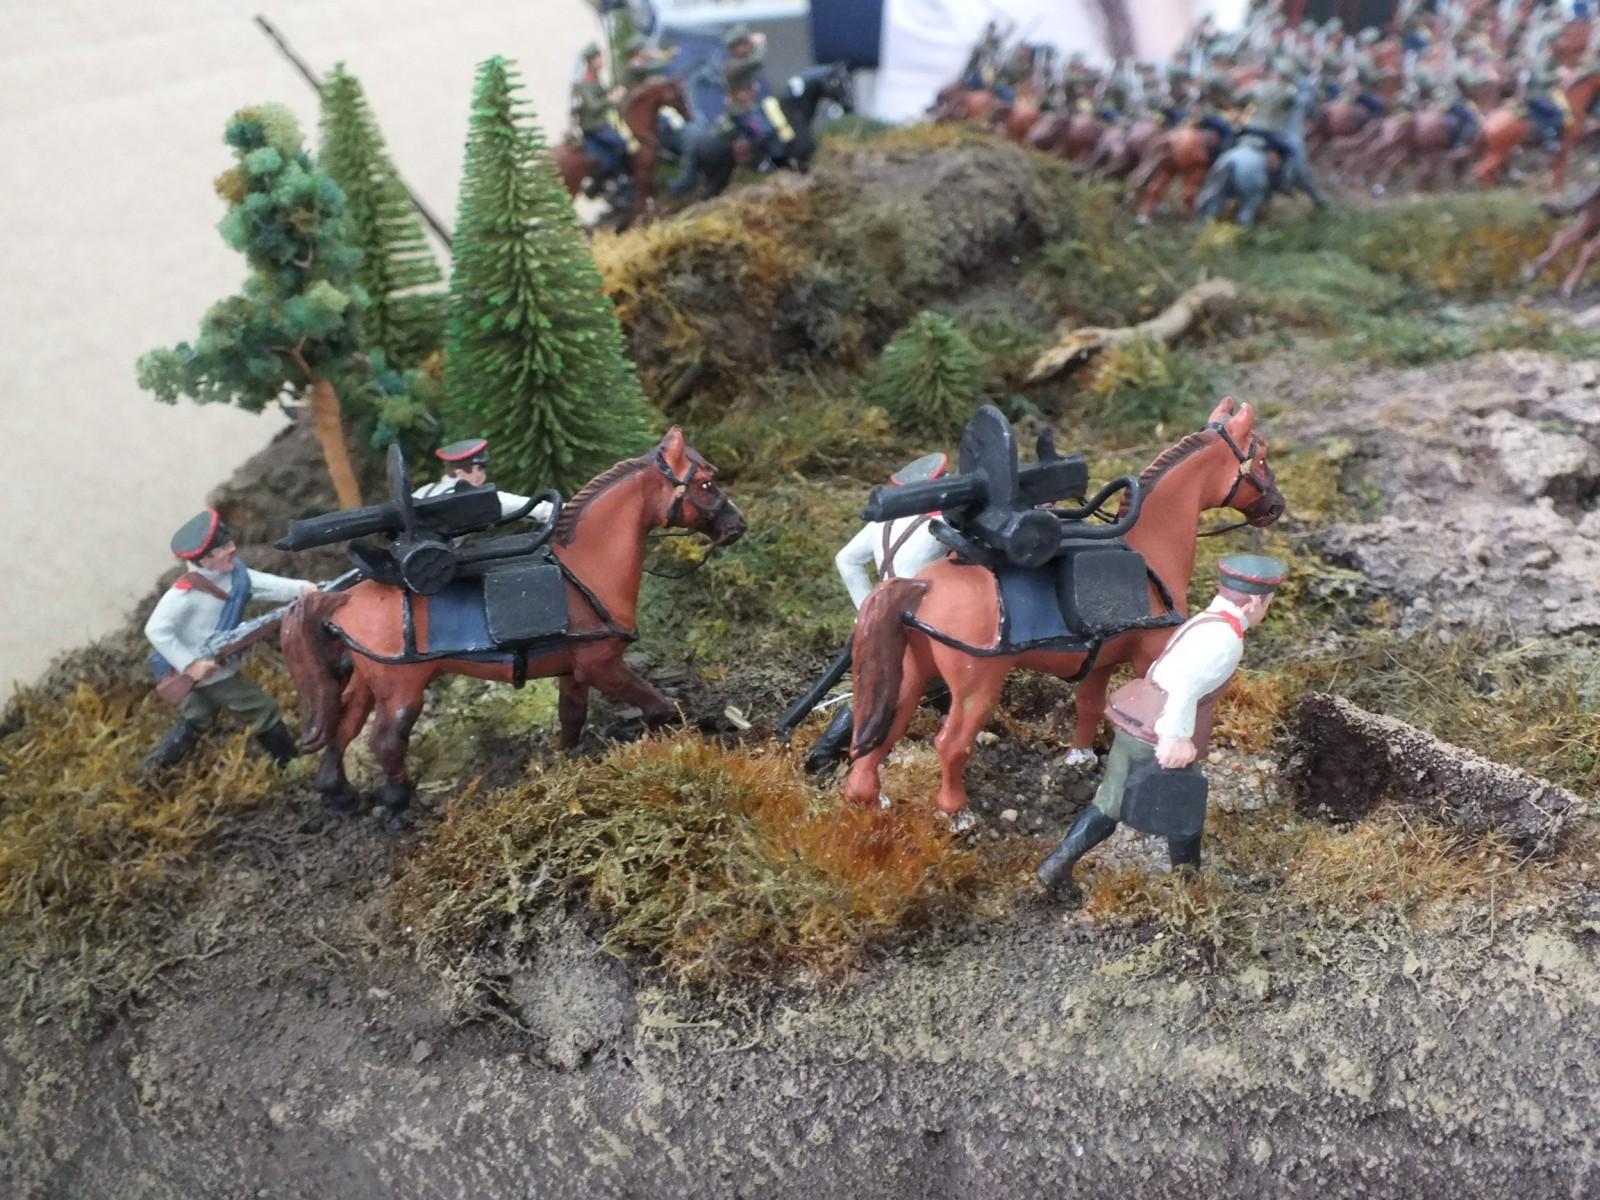 Атака  кавалерийского эскадрона РИА  в ПМВ DSCF0005(2)